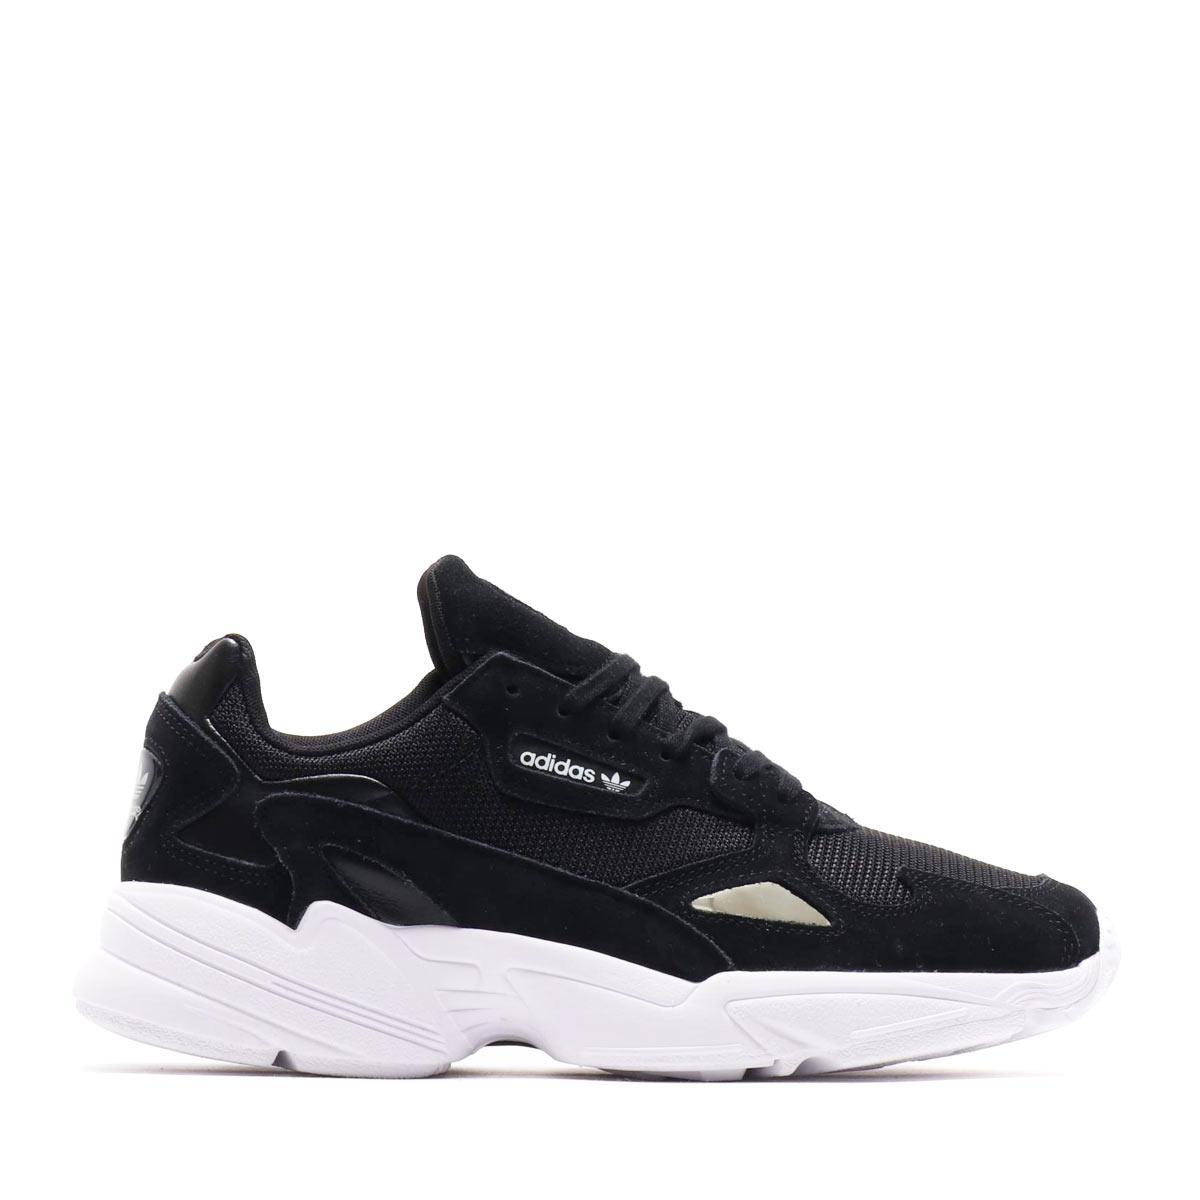 4f8df47498335b adidas Originals FALCON W (Adidas originals falcon W) CORE BLACK CORE  BLACK RUNNING WHITE 18FW-S